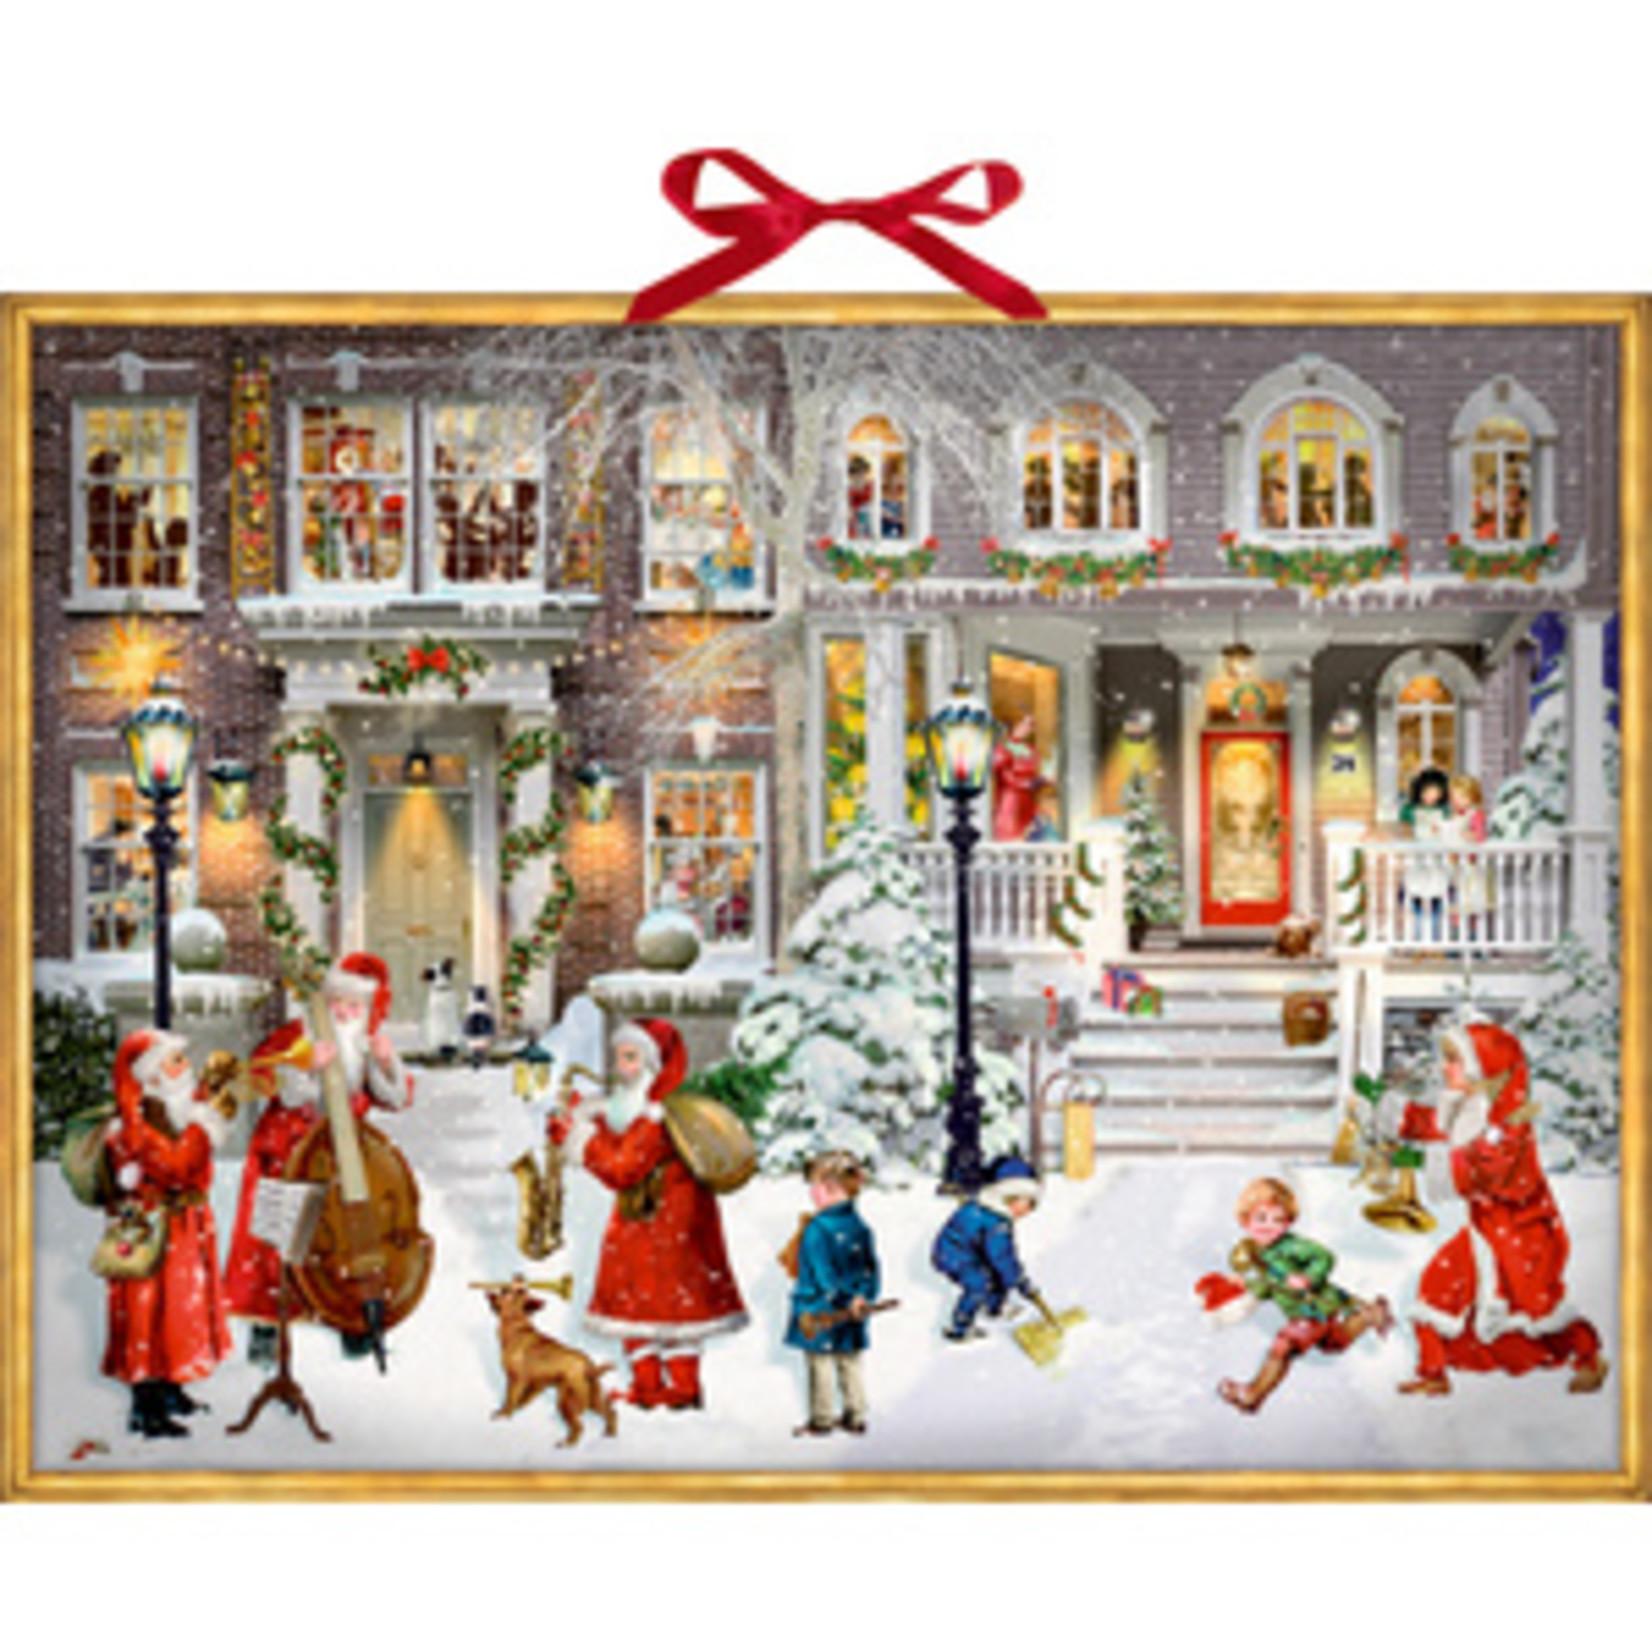 Coppenrath Adventskalender A3 mit Sound: Having a Wonderful Christmas Time